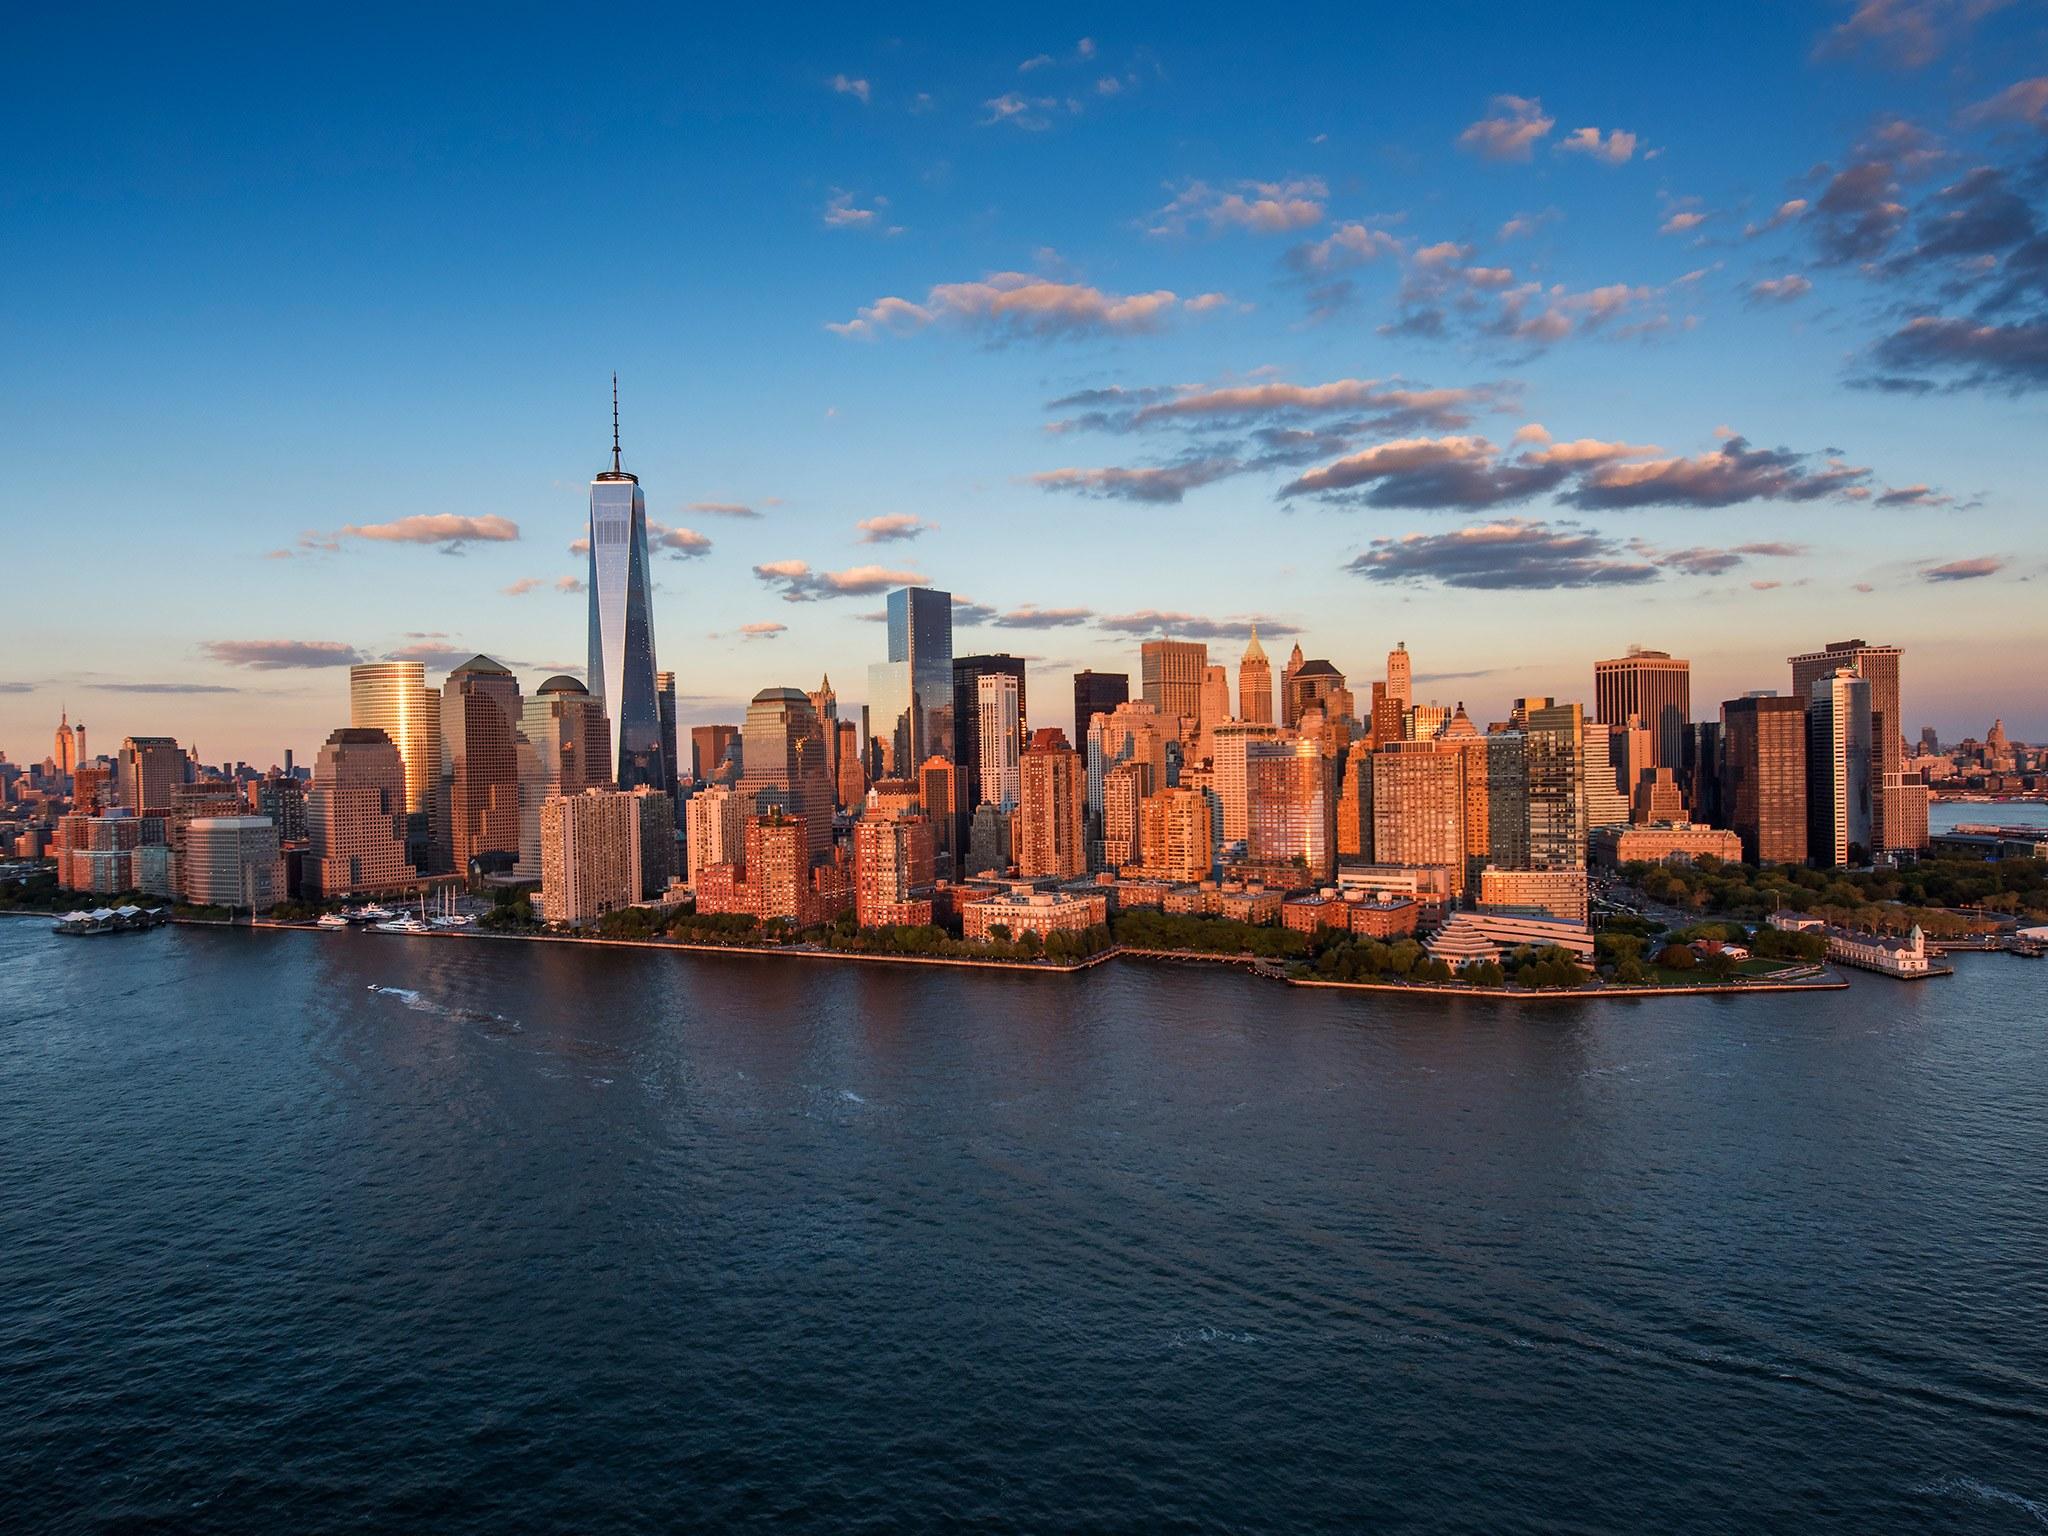 New York destí estrella al 2020